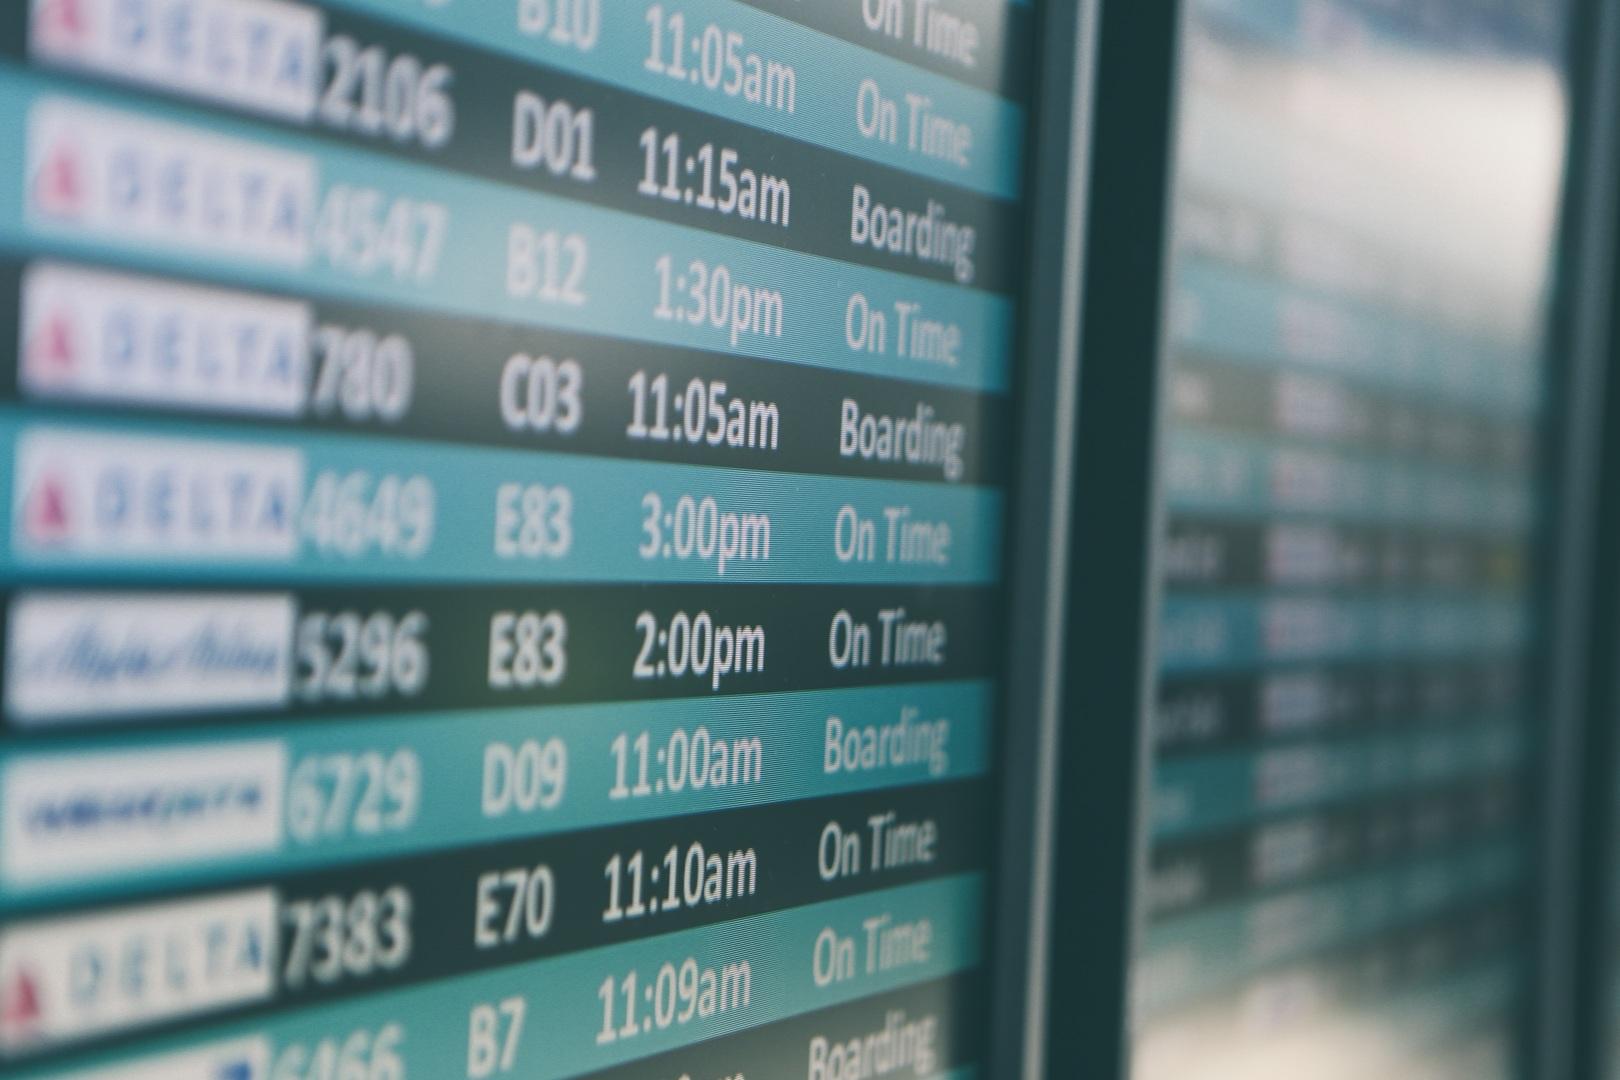 digital signage beelschermcommunicatie vliegveld digitaal bord